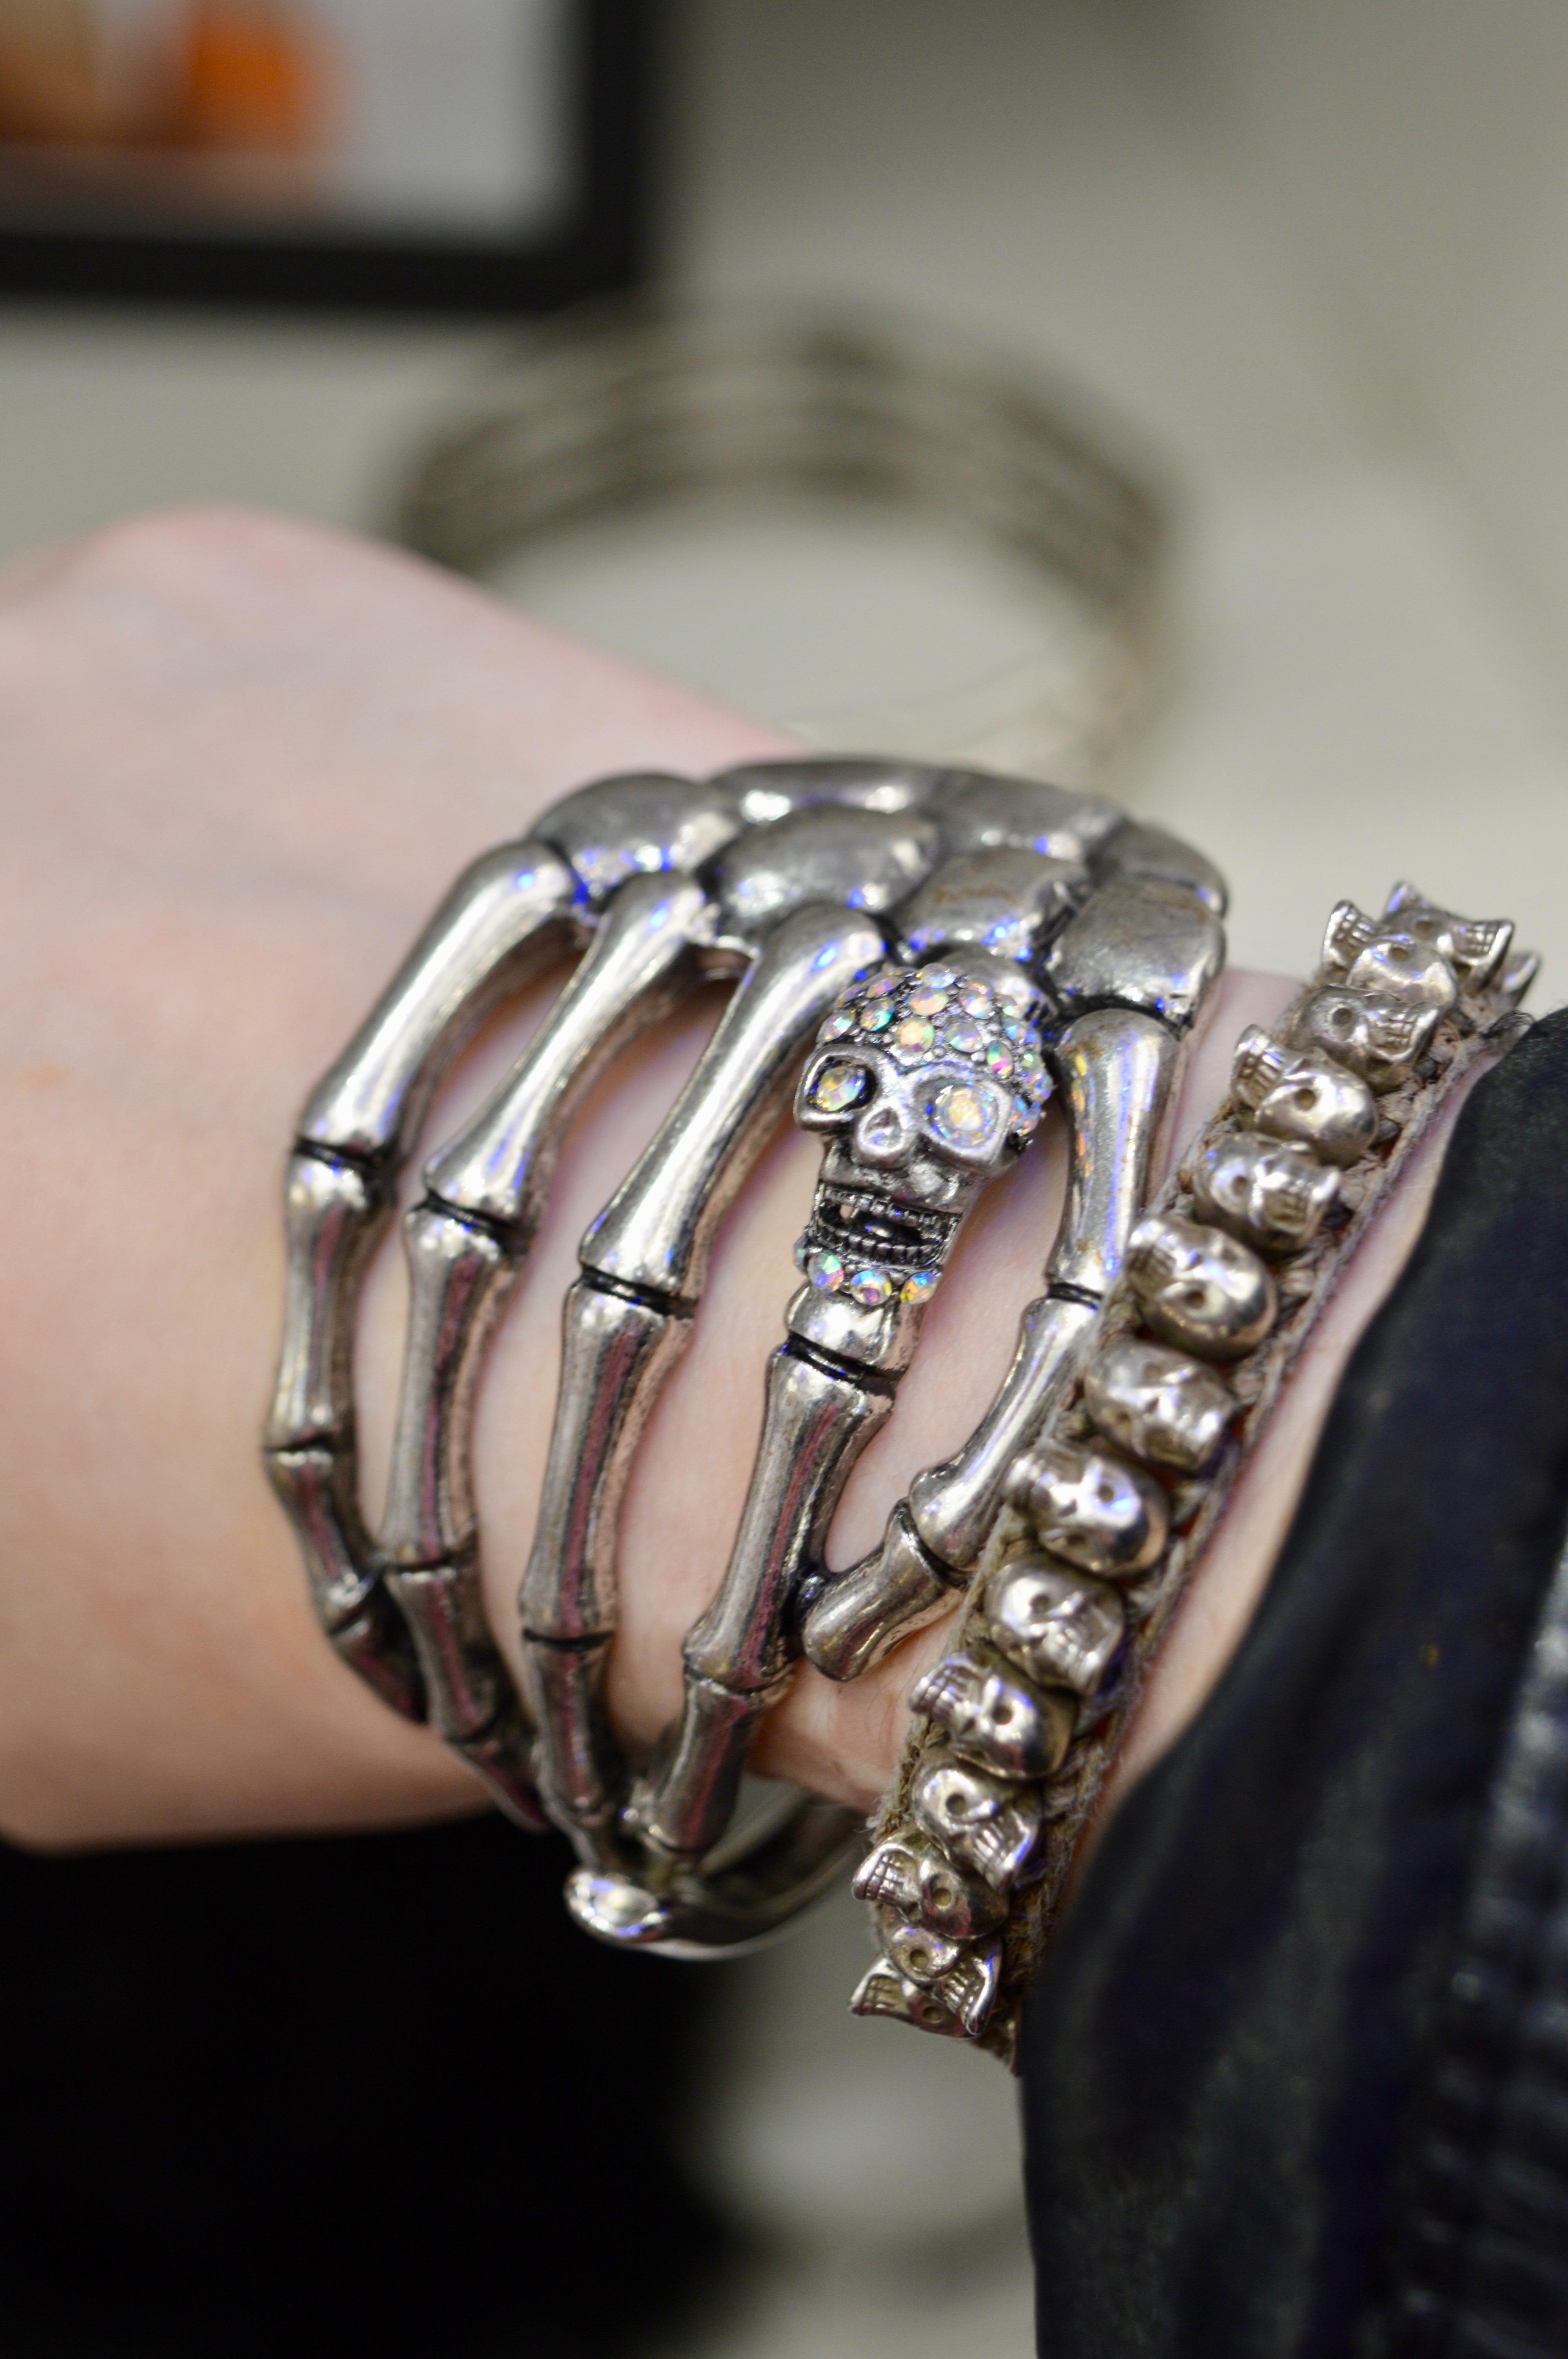 skull-bracelet-intu-eldon-square-winter-fashion-stylissimo-newcastle-high-street-halloween-elle-blonde-luxury-lifestyle-destination-blog